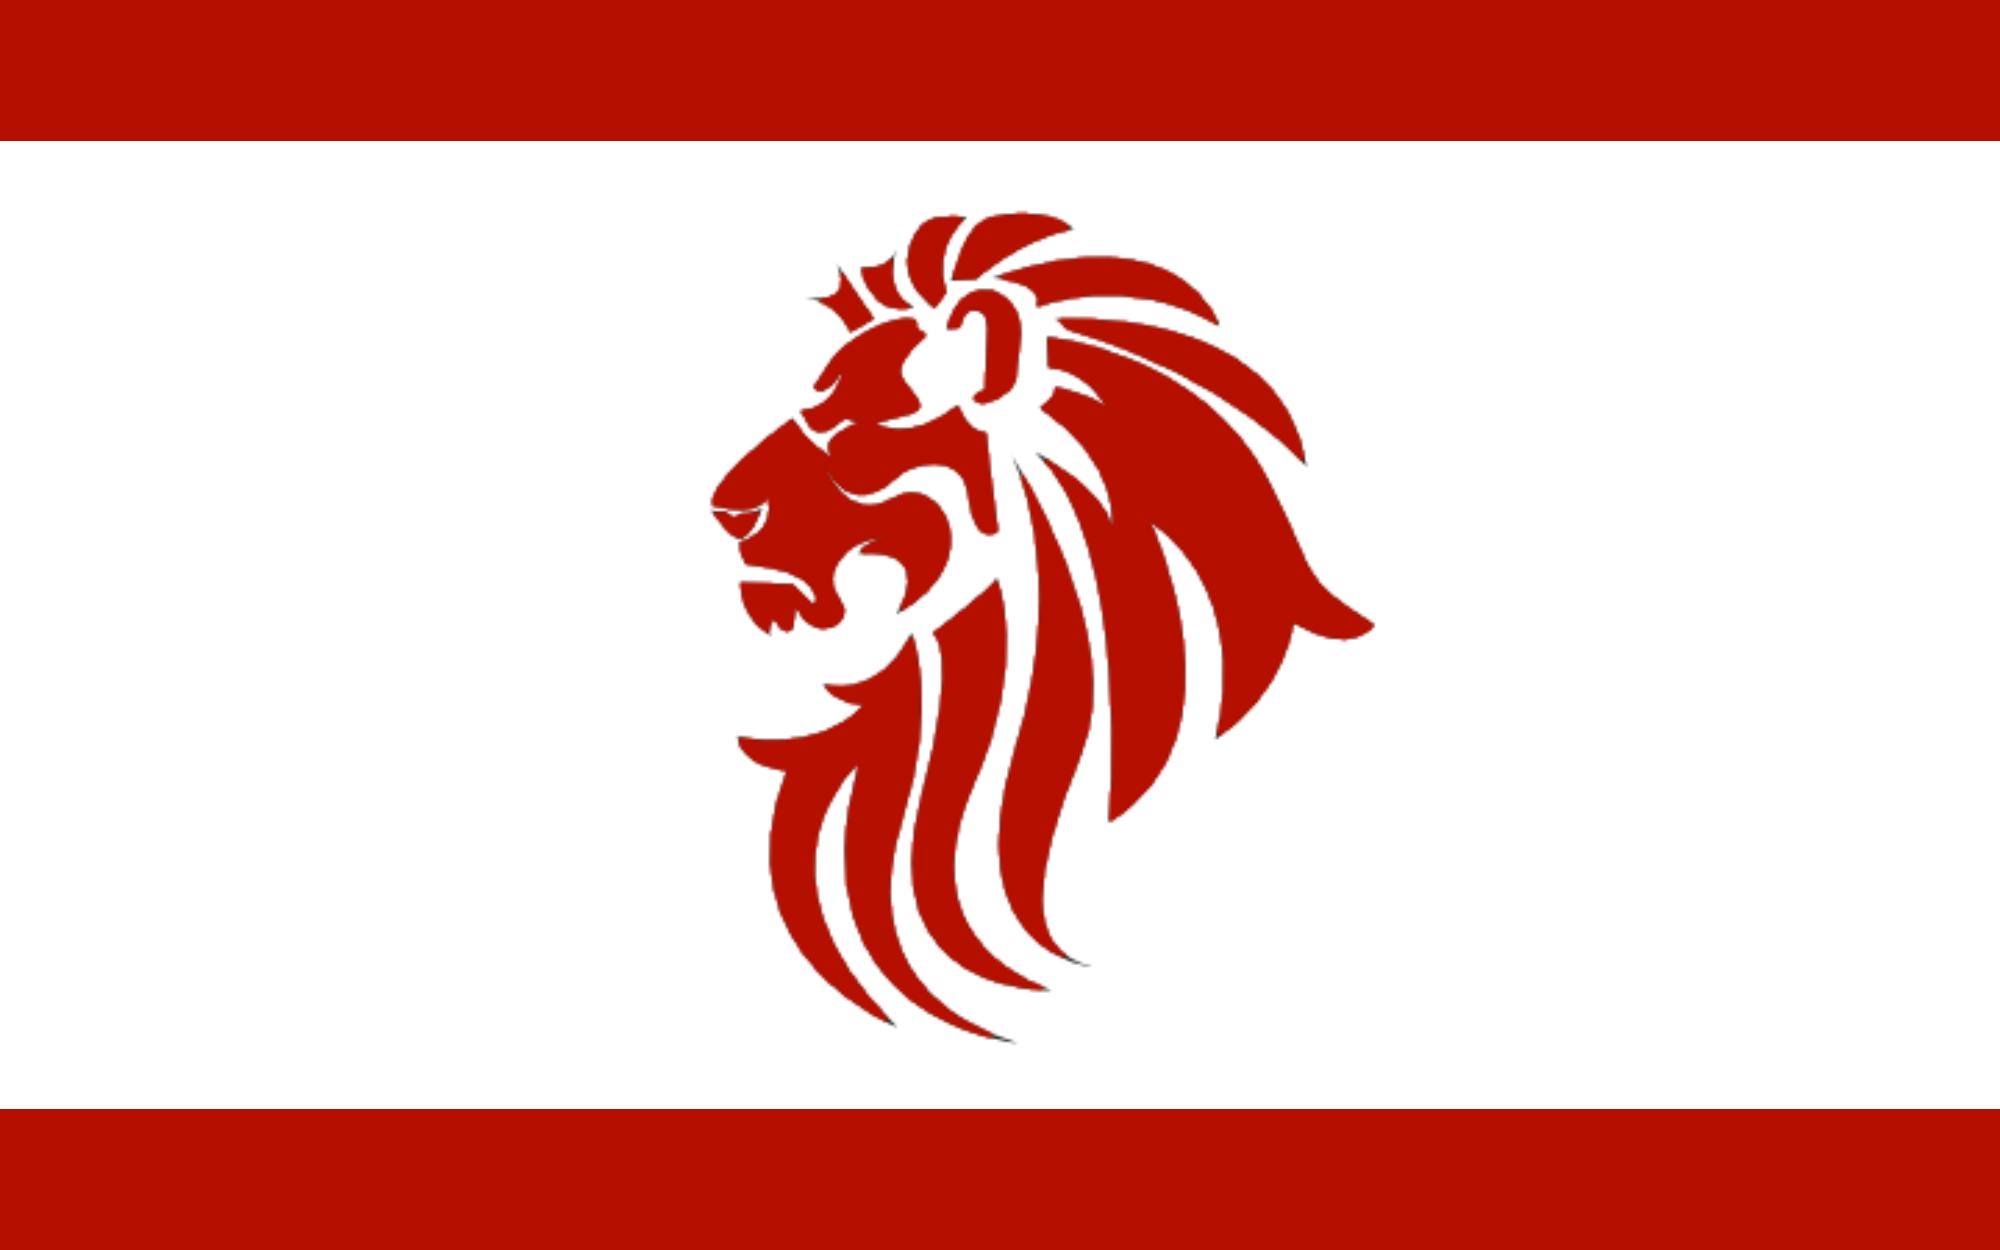 England (Long Live The Republic)